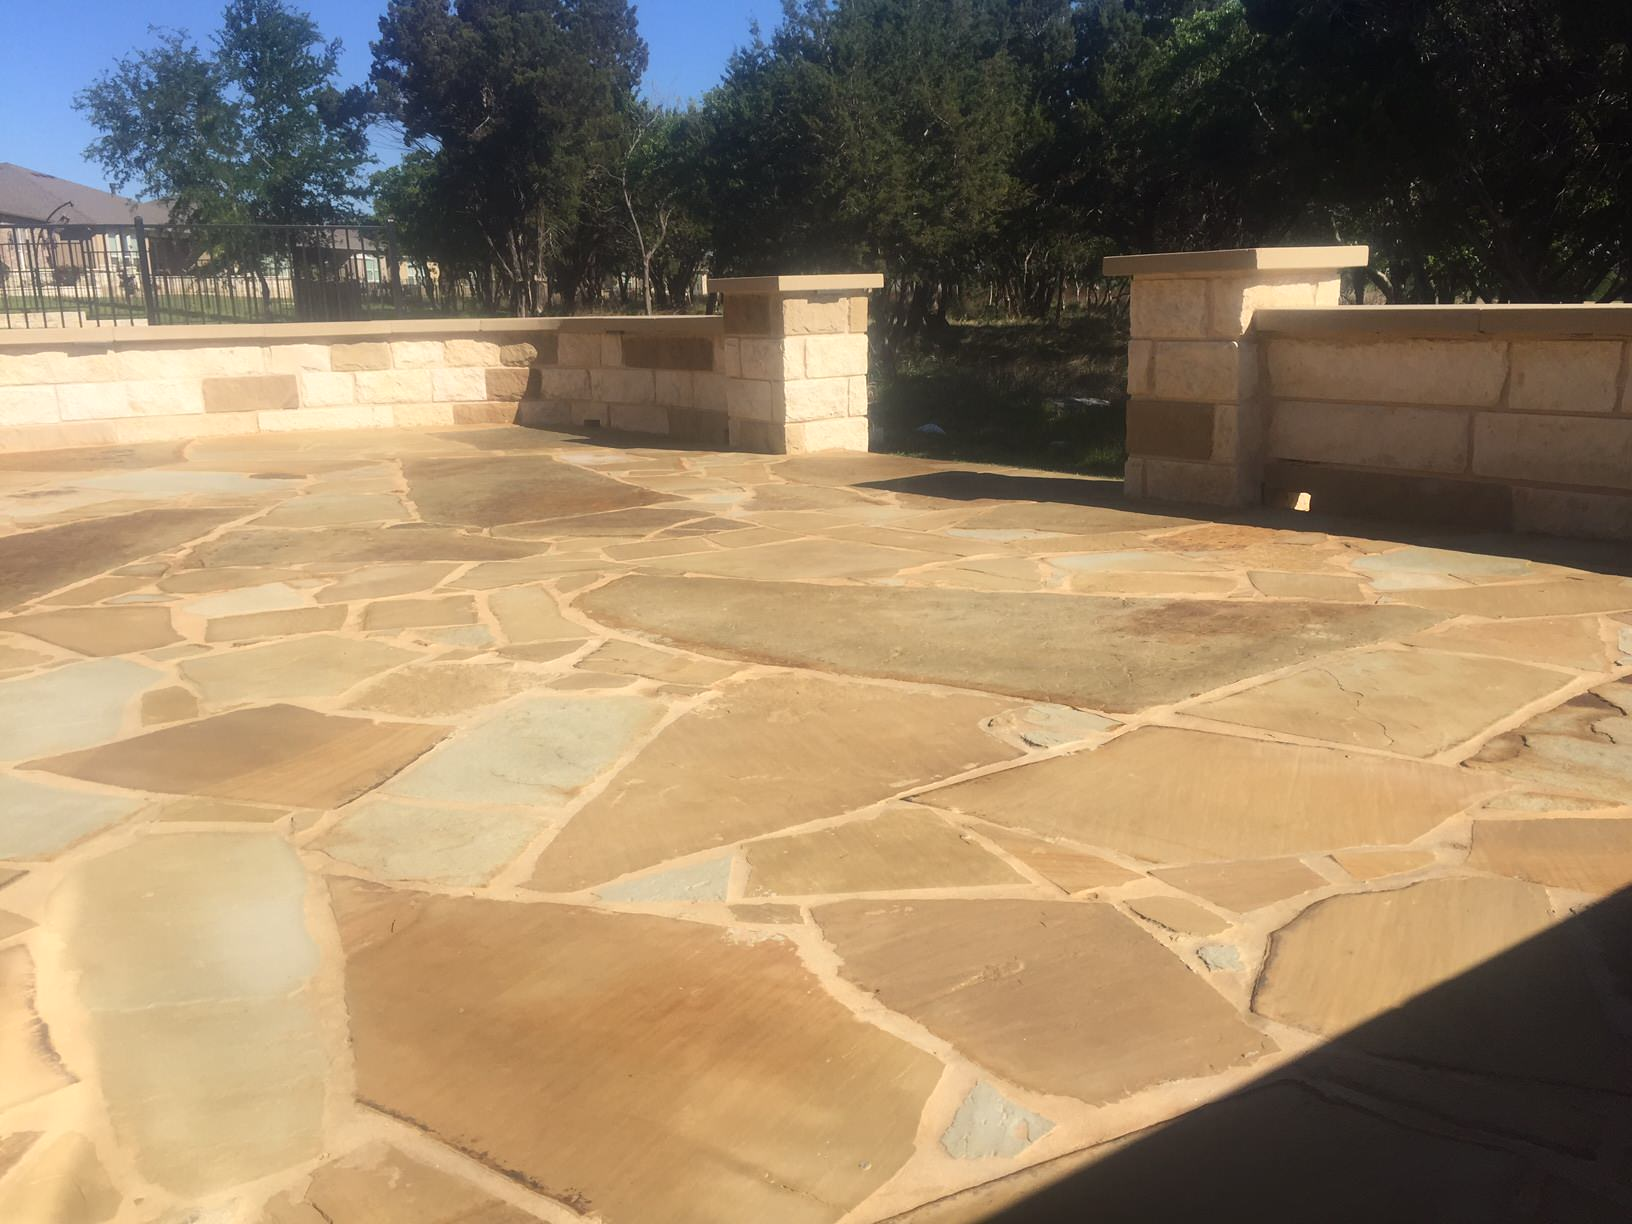 Flagstone patio & seatwalls